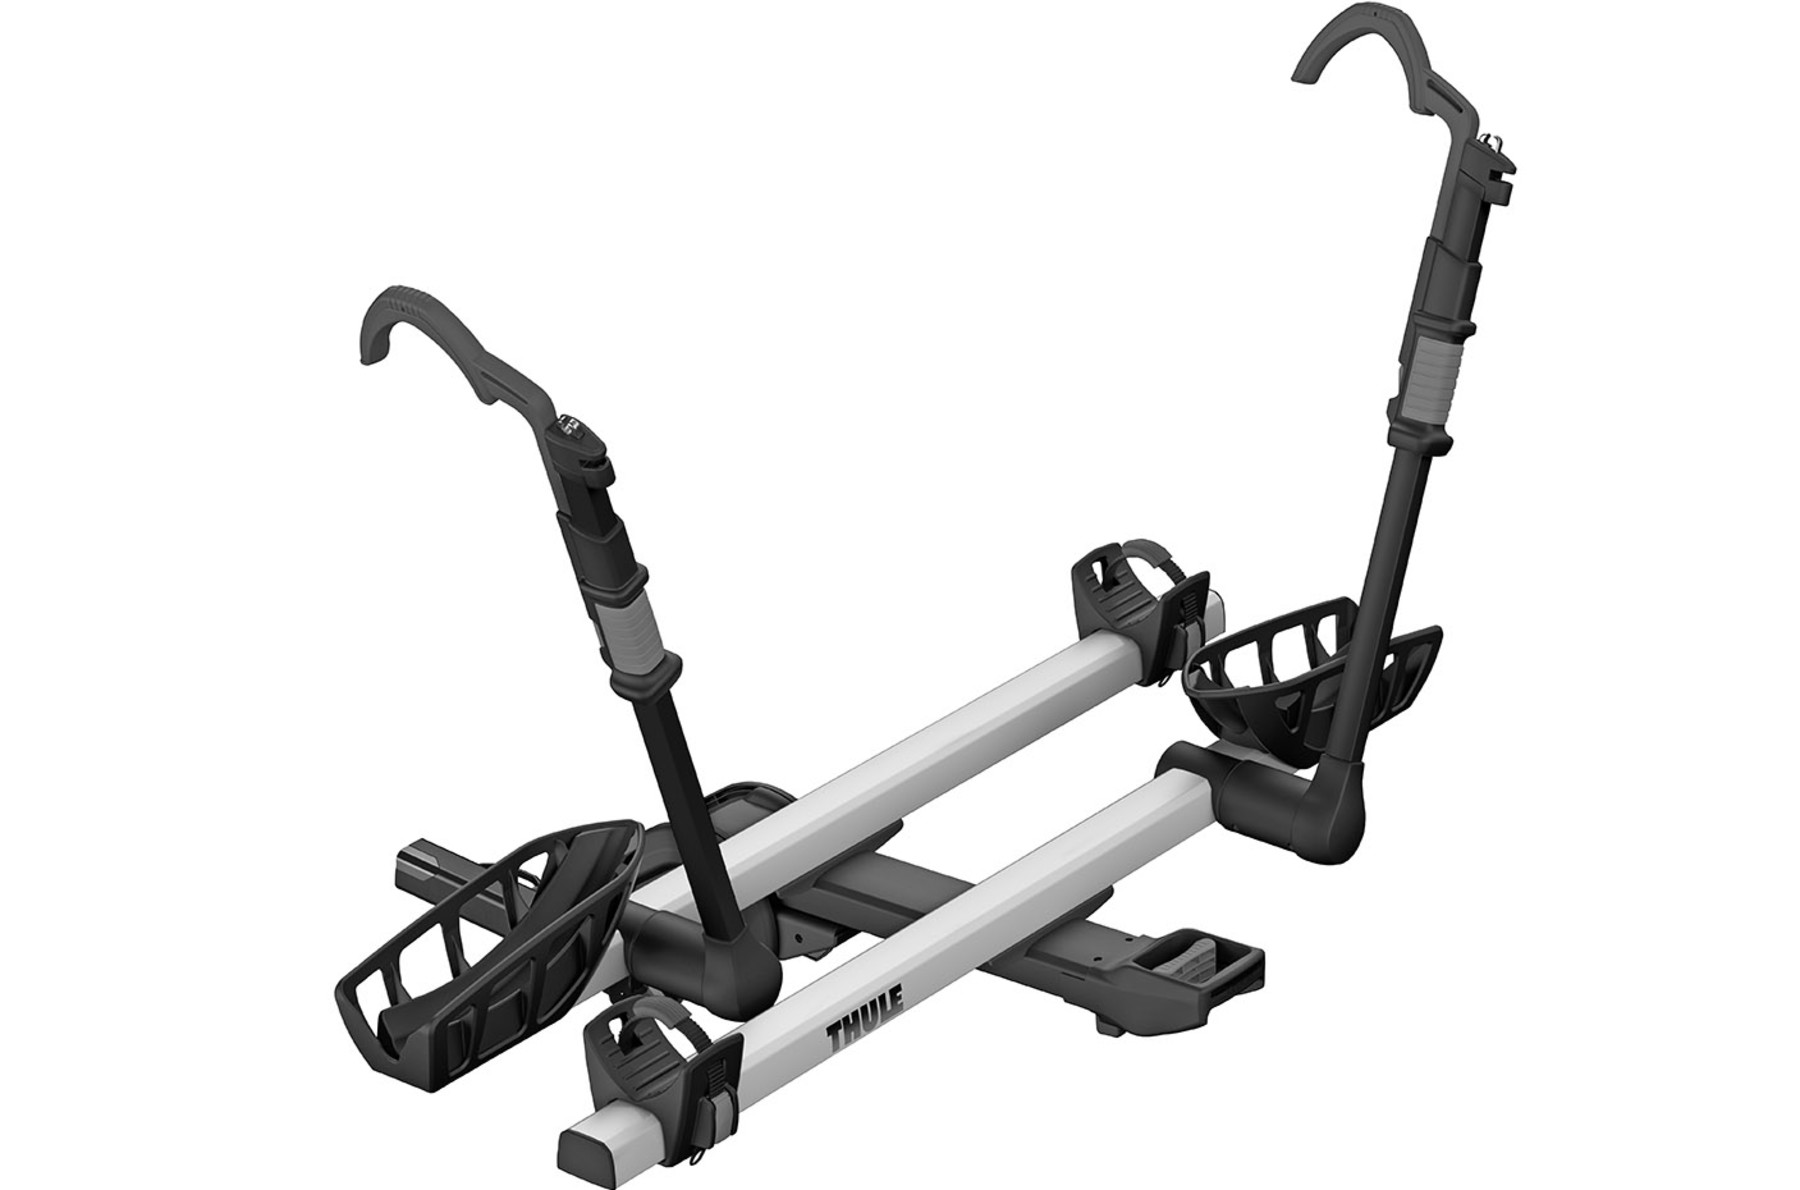 Thule Platform Style Bike Racks - Thule T2 Pro XT 2